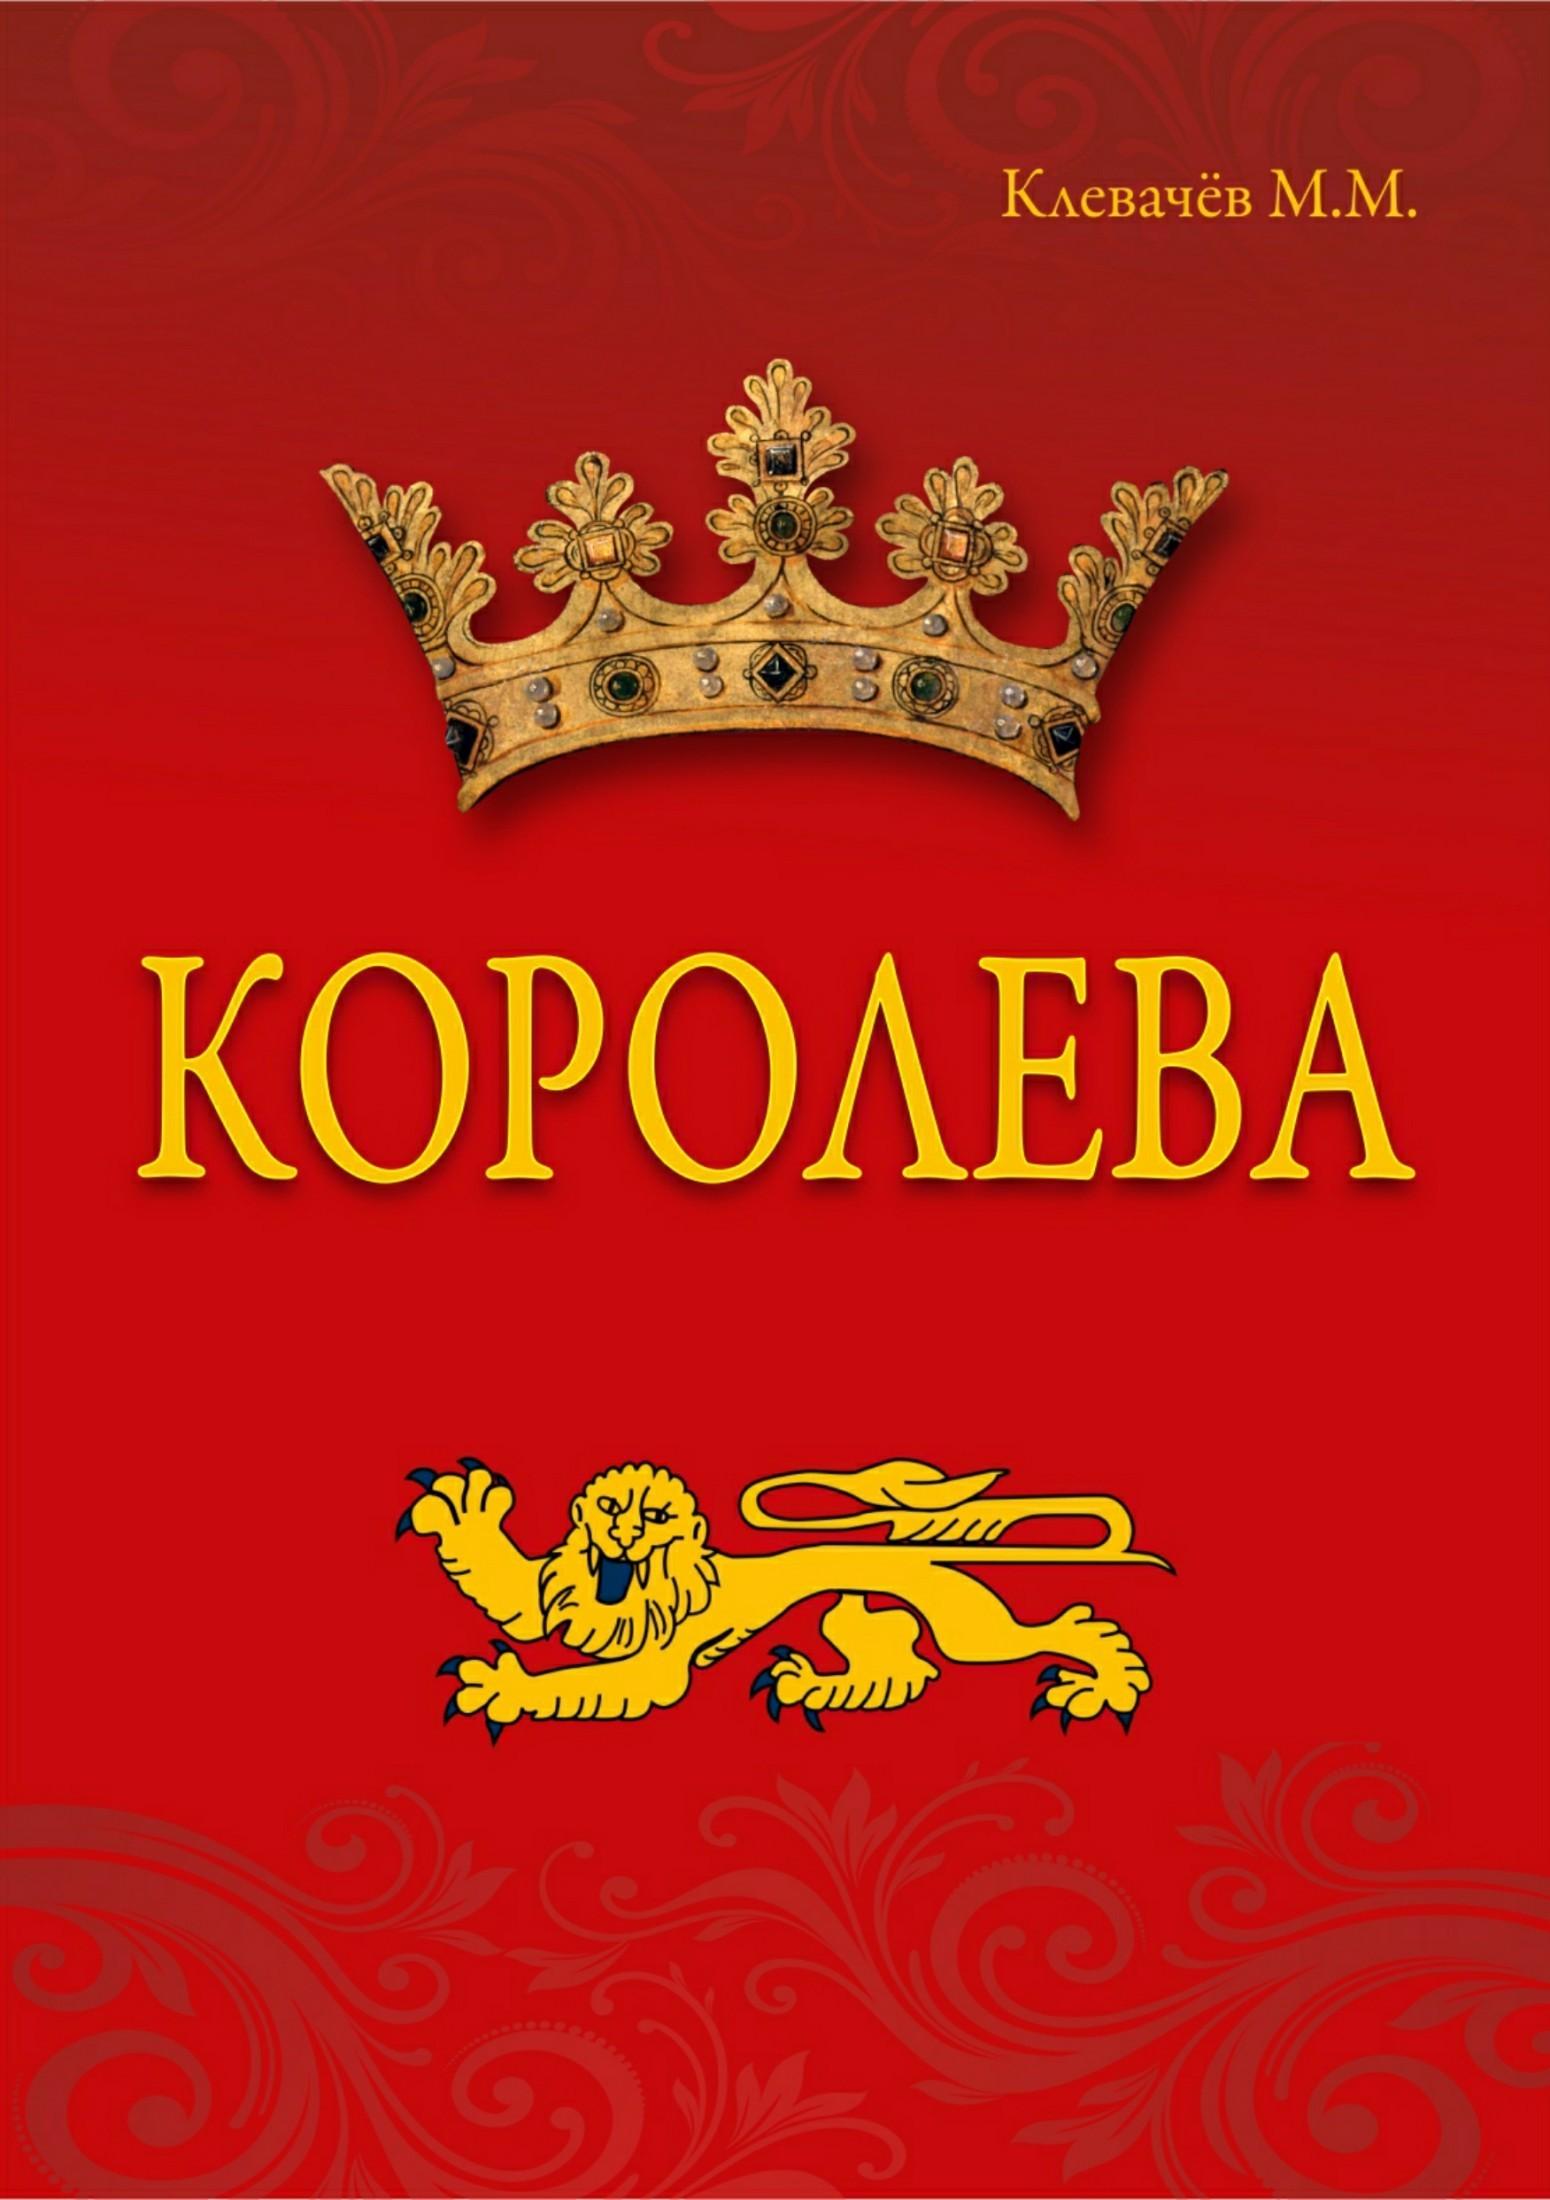 Михаил Клевачев, Алексей Клевачев - Королева